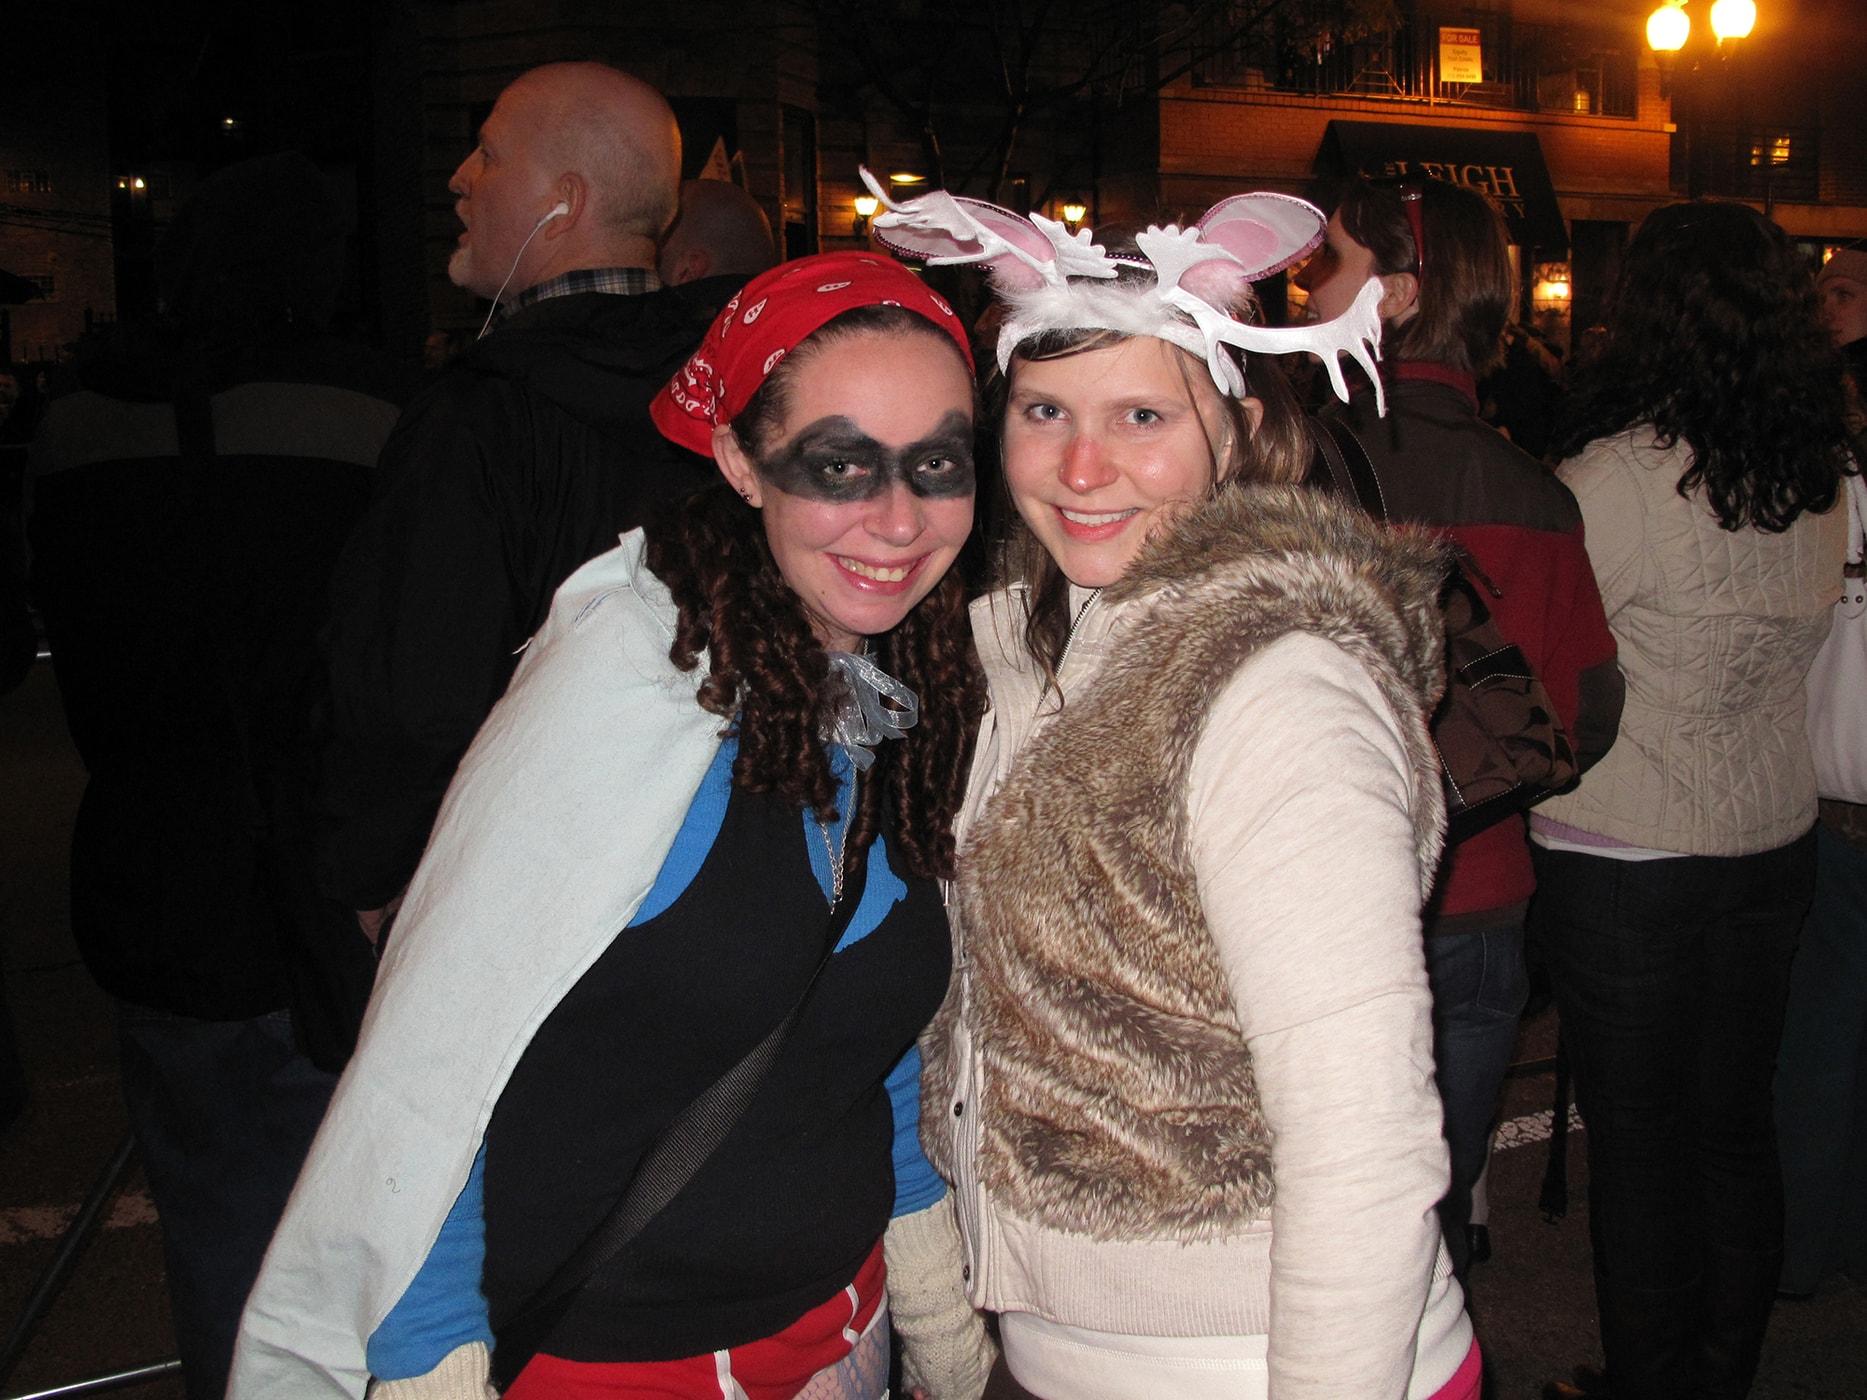 Jackalope Halloween Costume